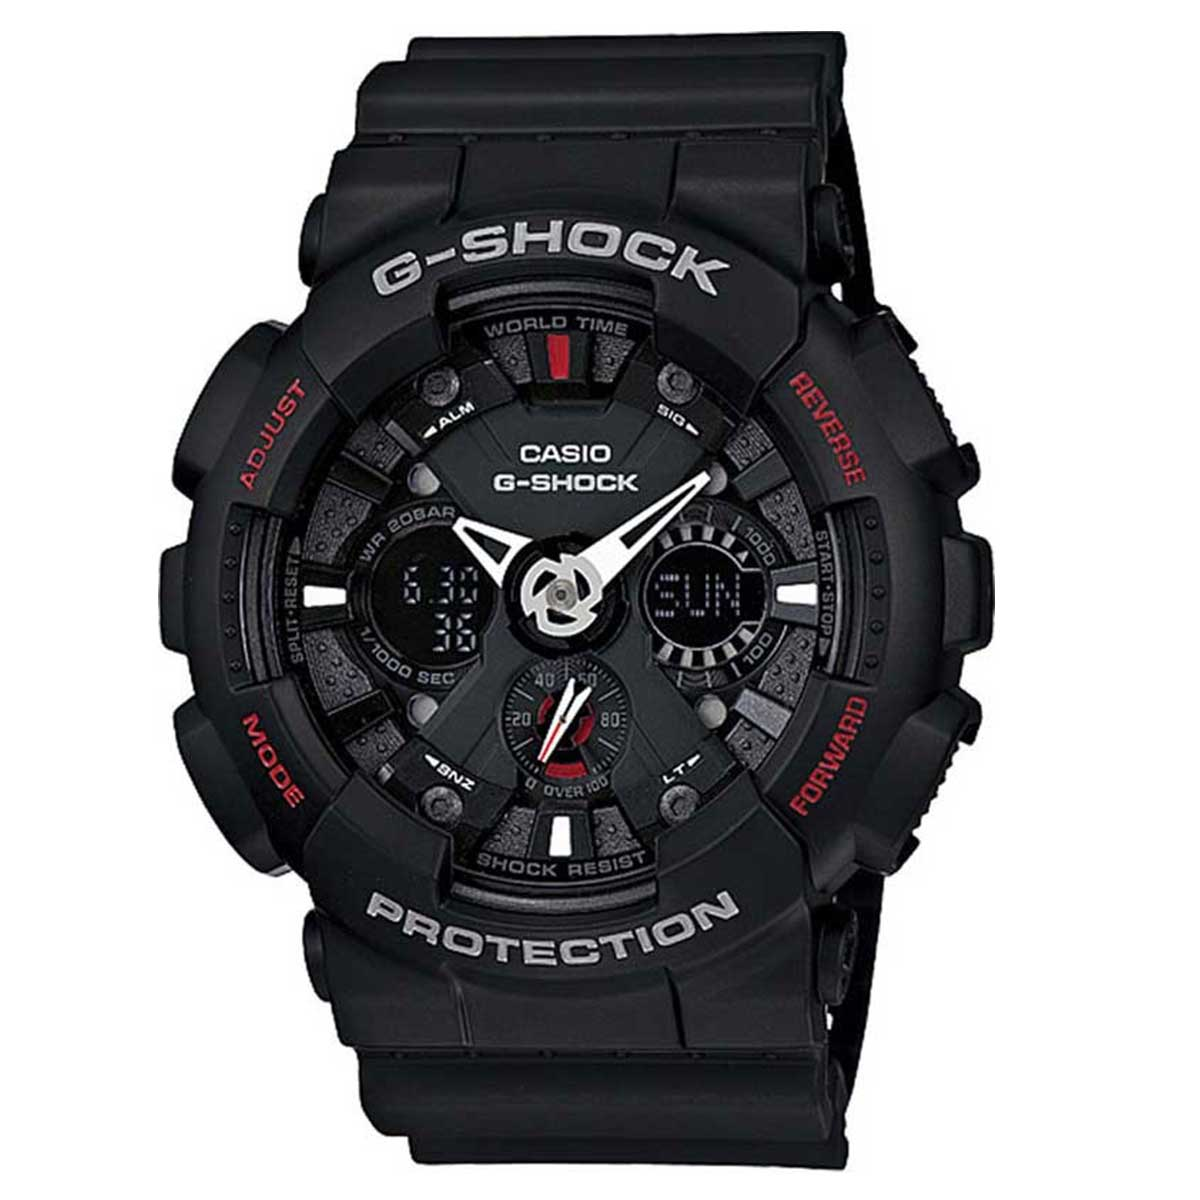 Relógio de Pulso Casio Masculino G-ShocK Modelo GA-120-1ADR